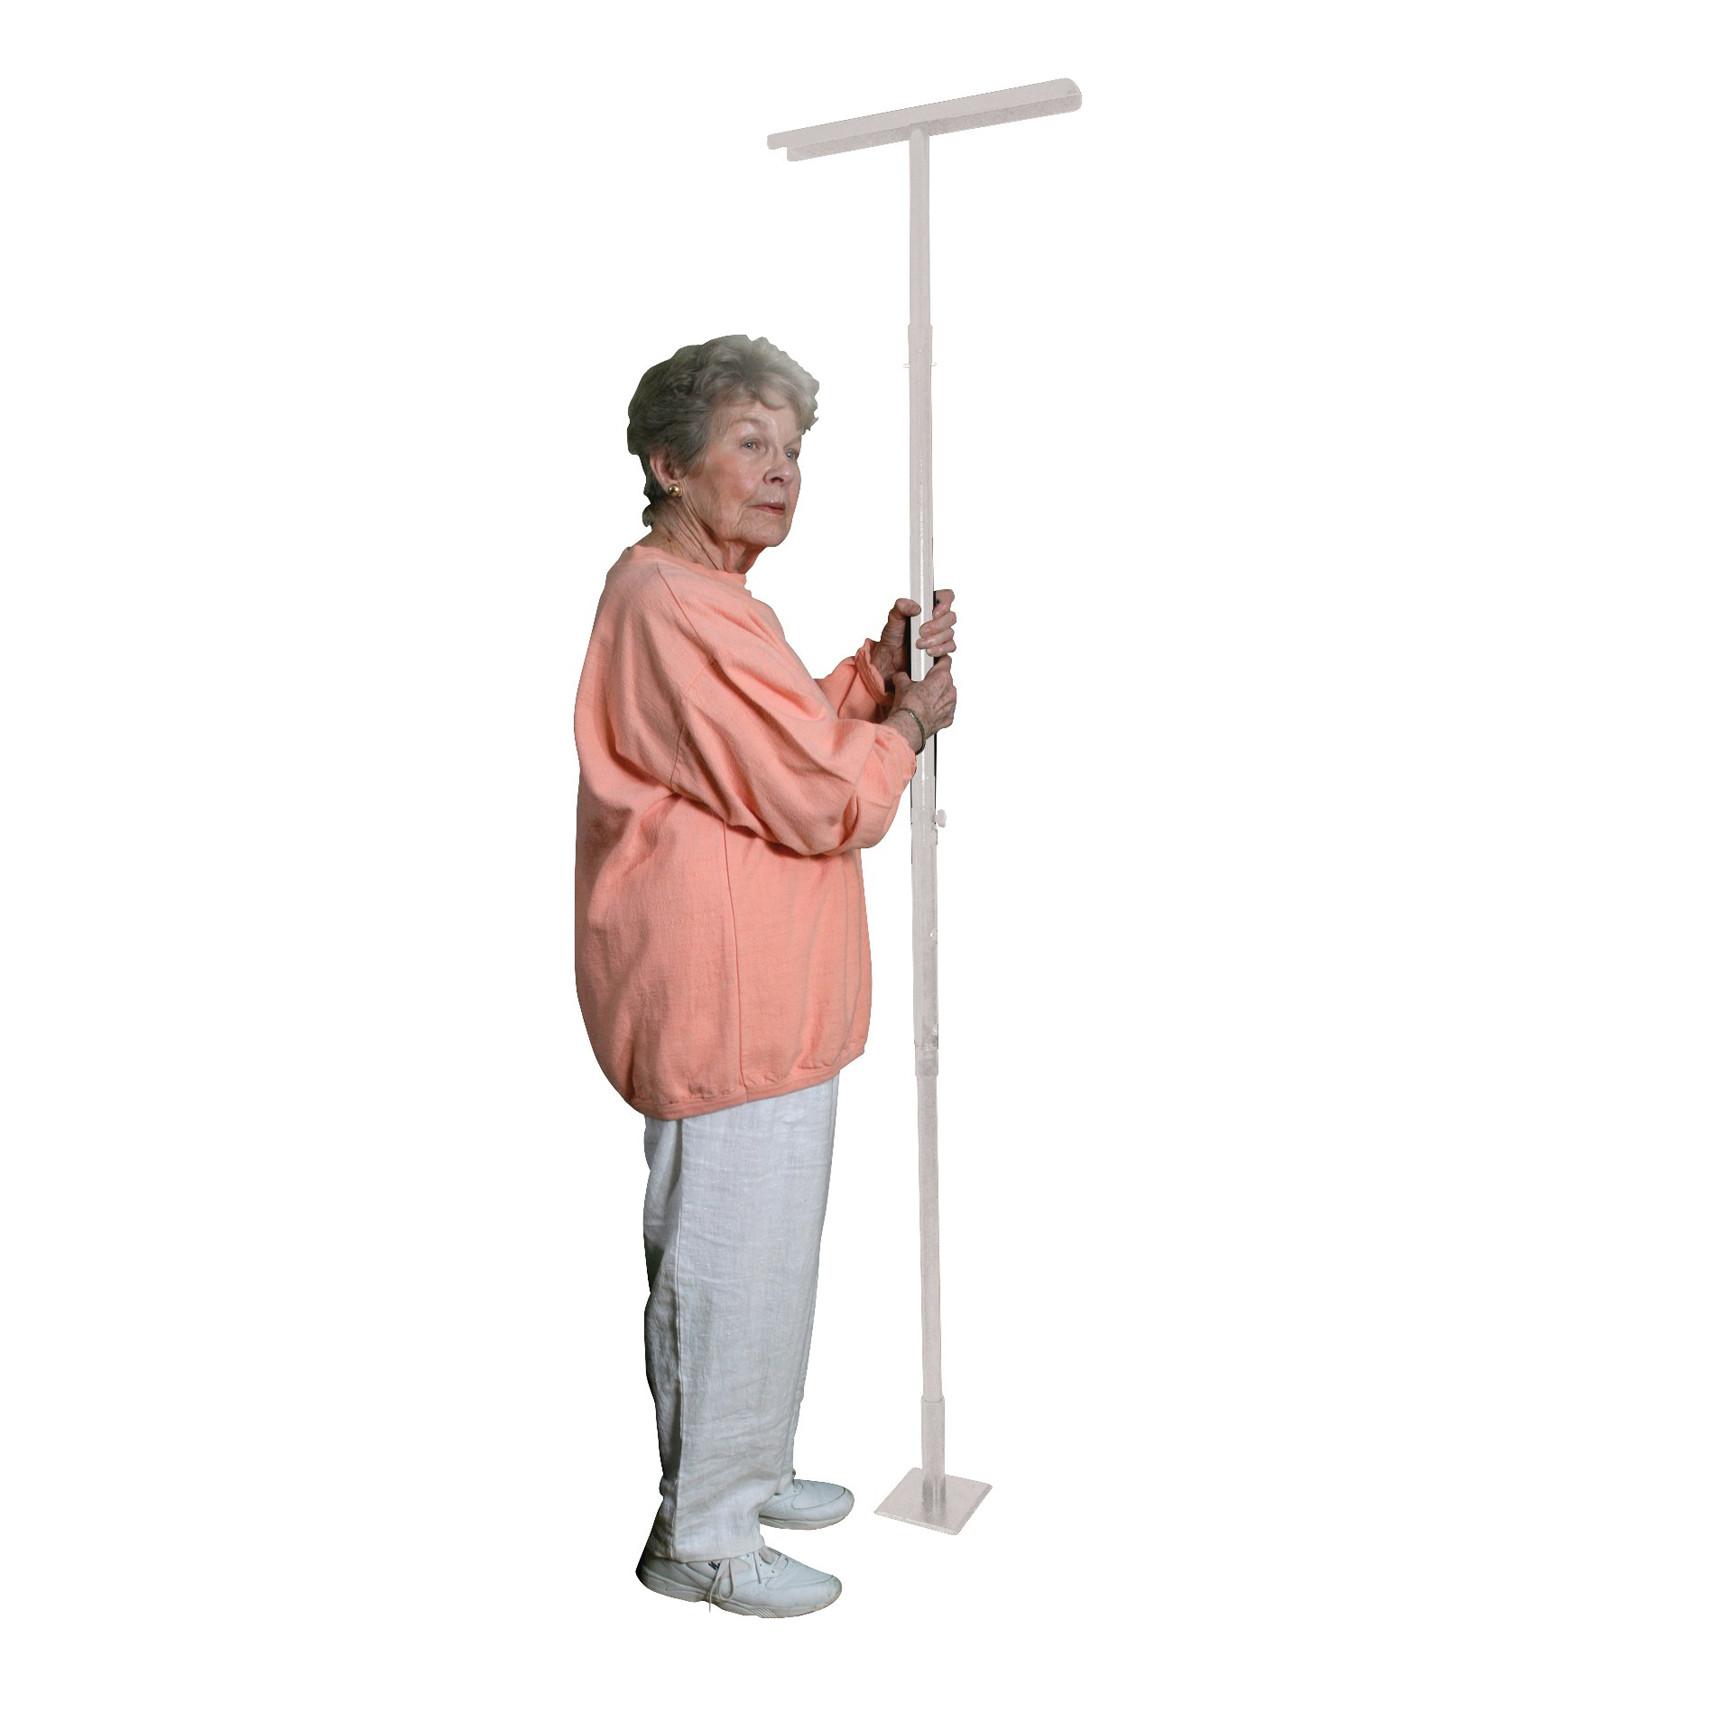 E-Z Assist Pole